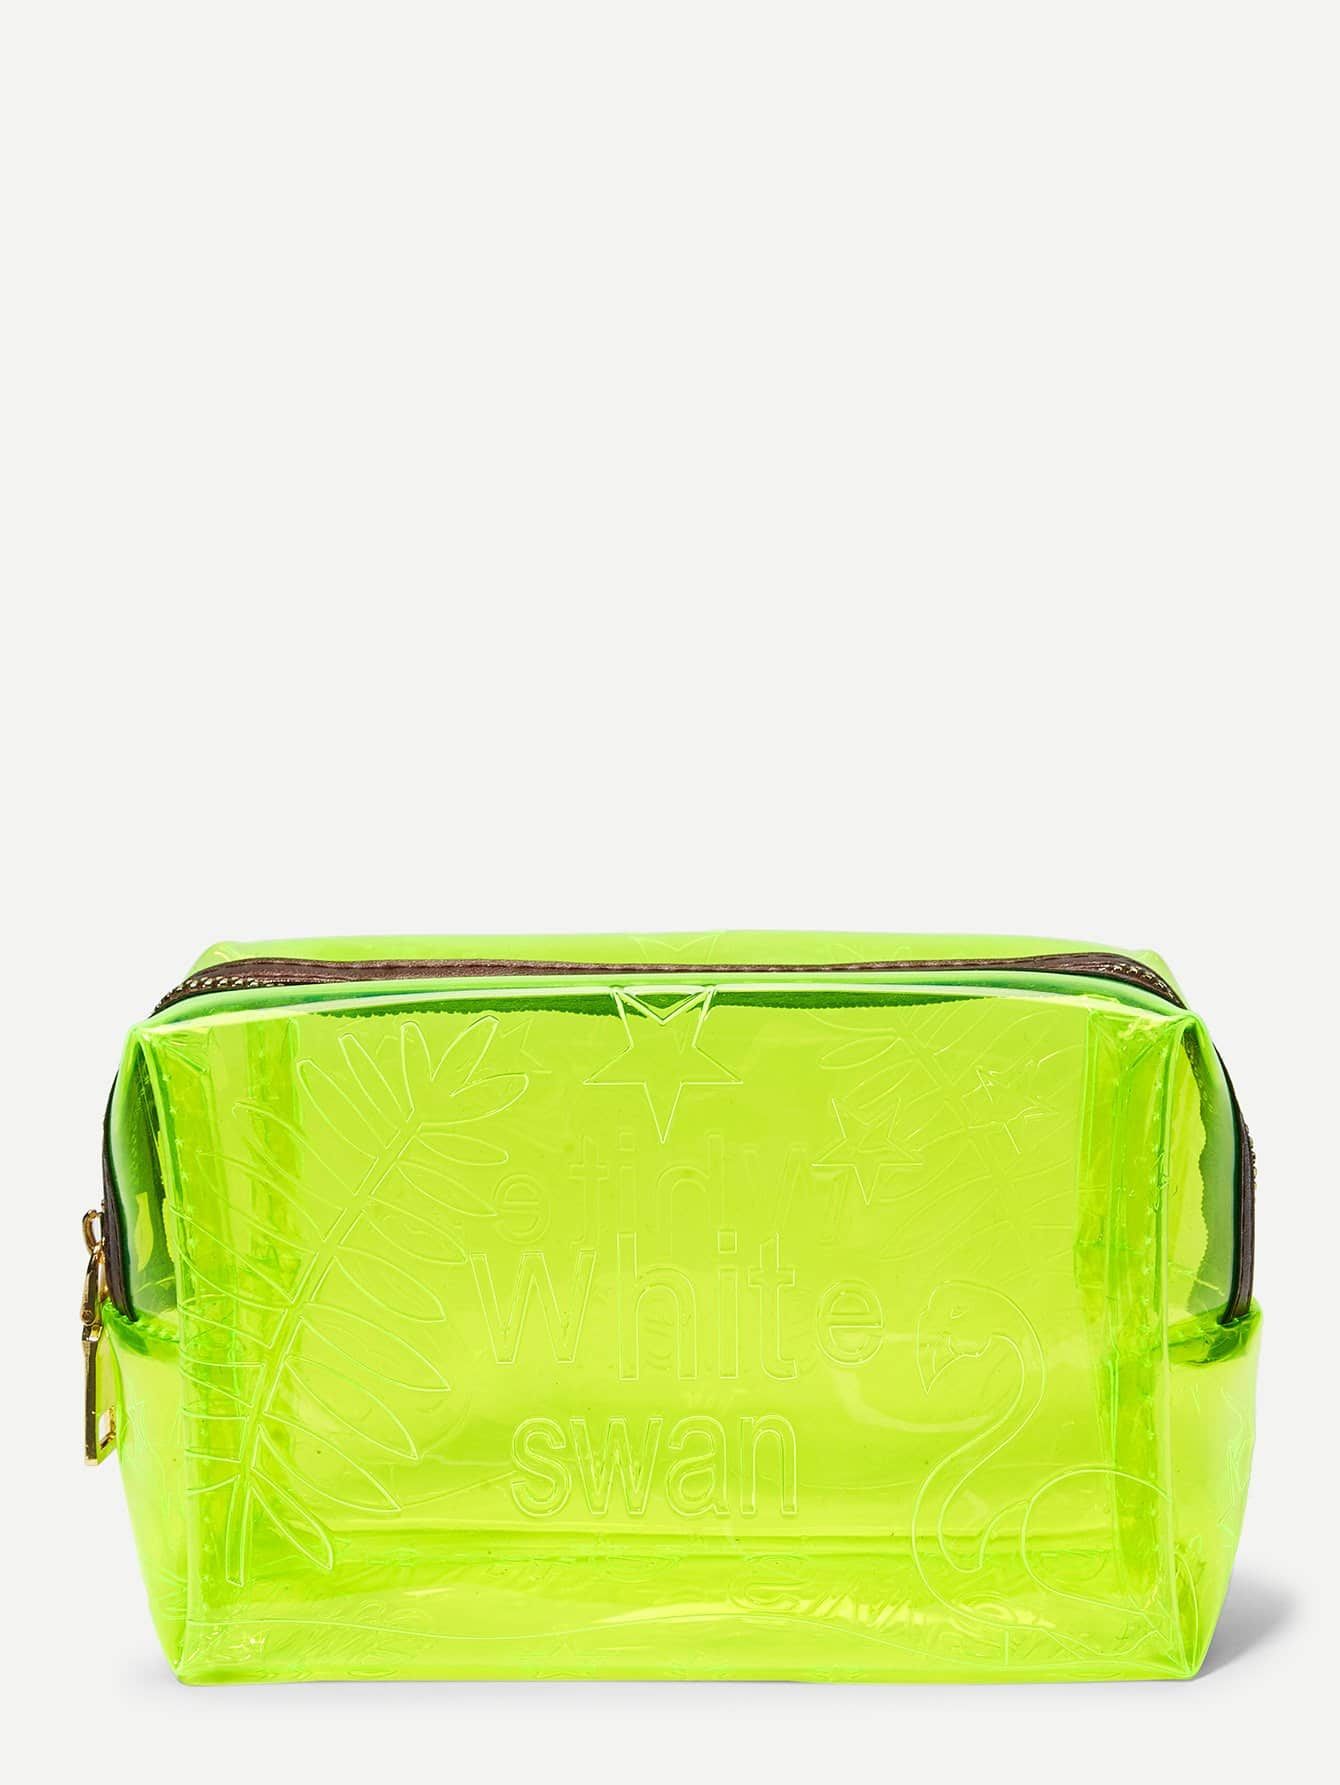 Leaf Pattern Clear Zipper Makeup Bag fashion women travel kit jewelry organizer makeup cosmetic bag